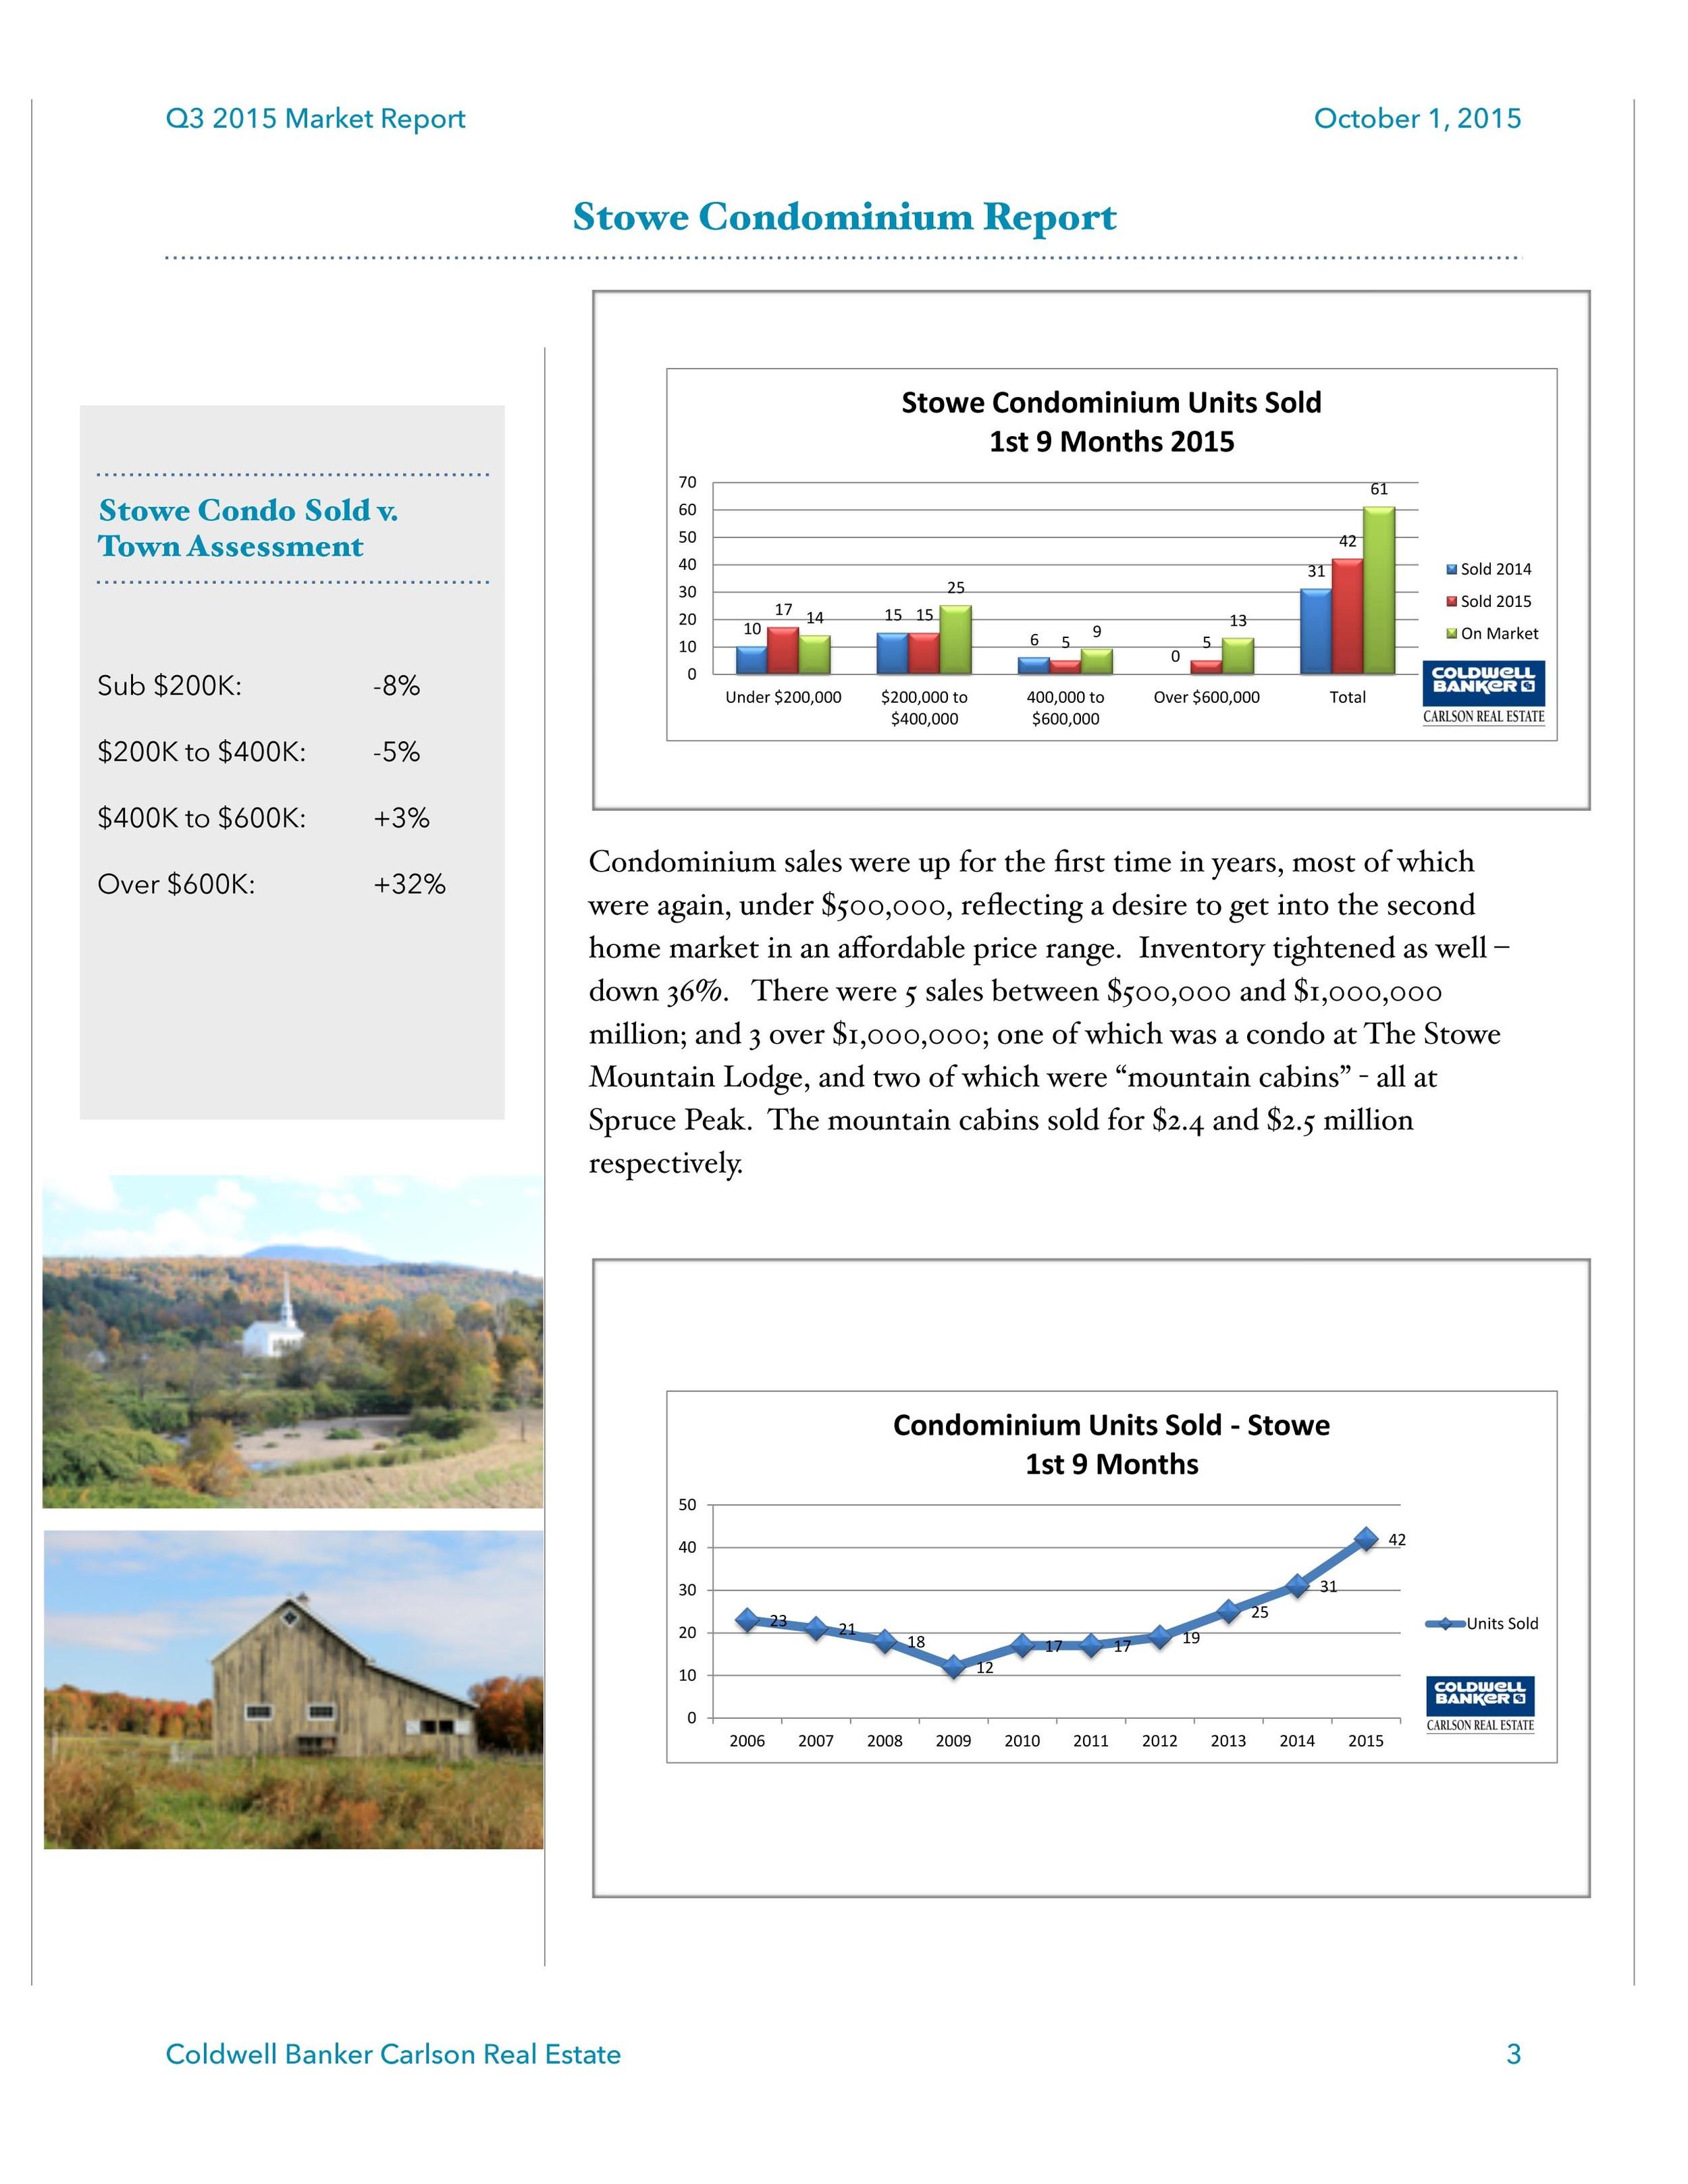 Q3 2015 Stowe Market Report Final